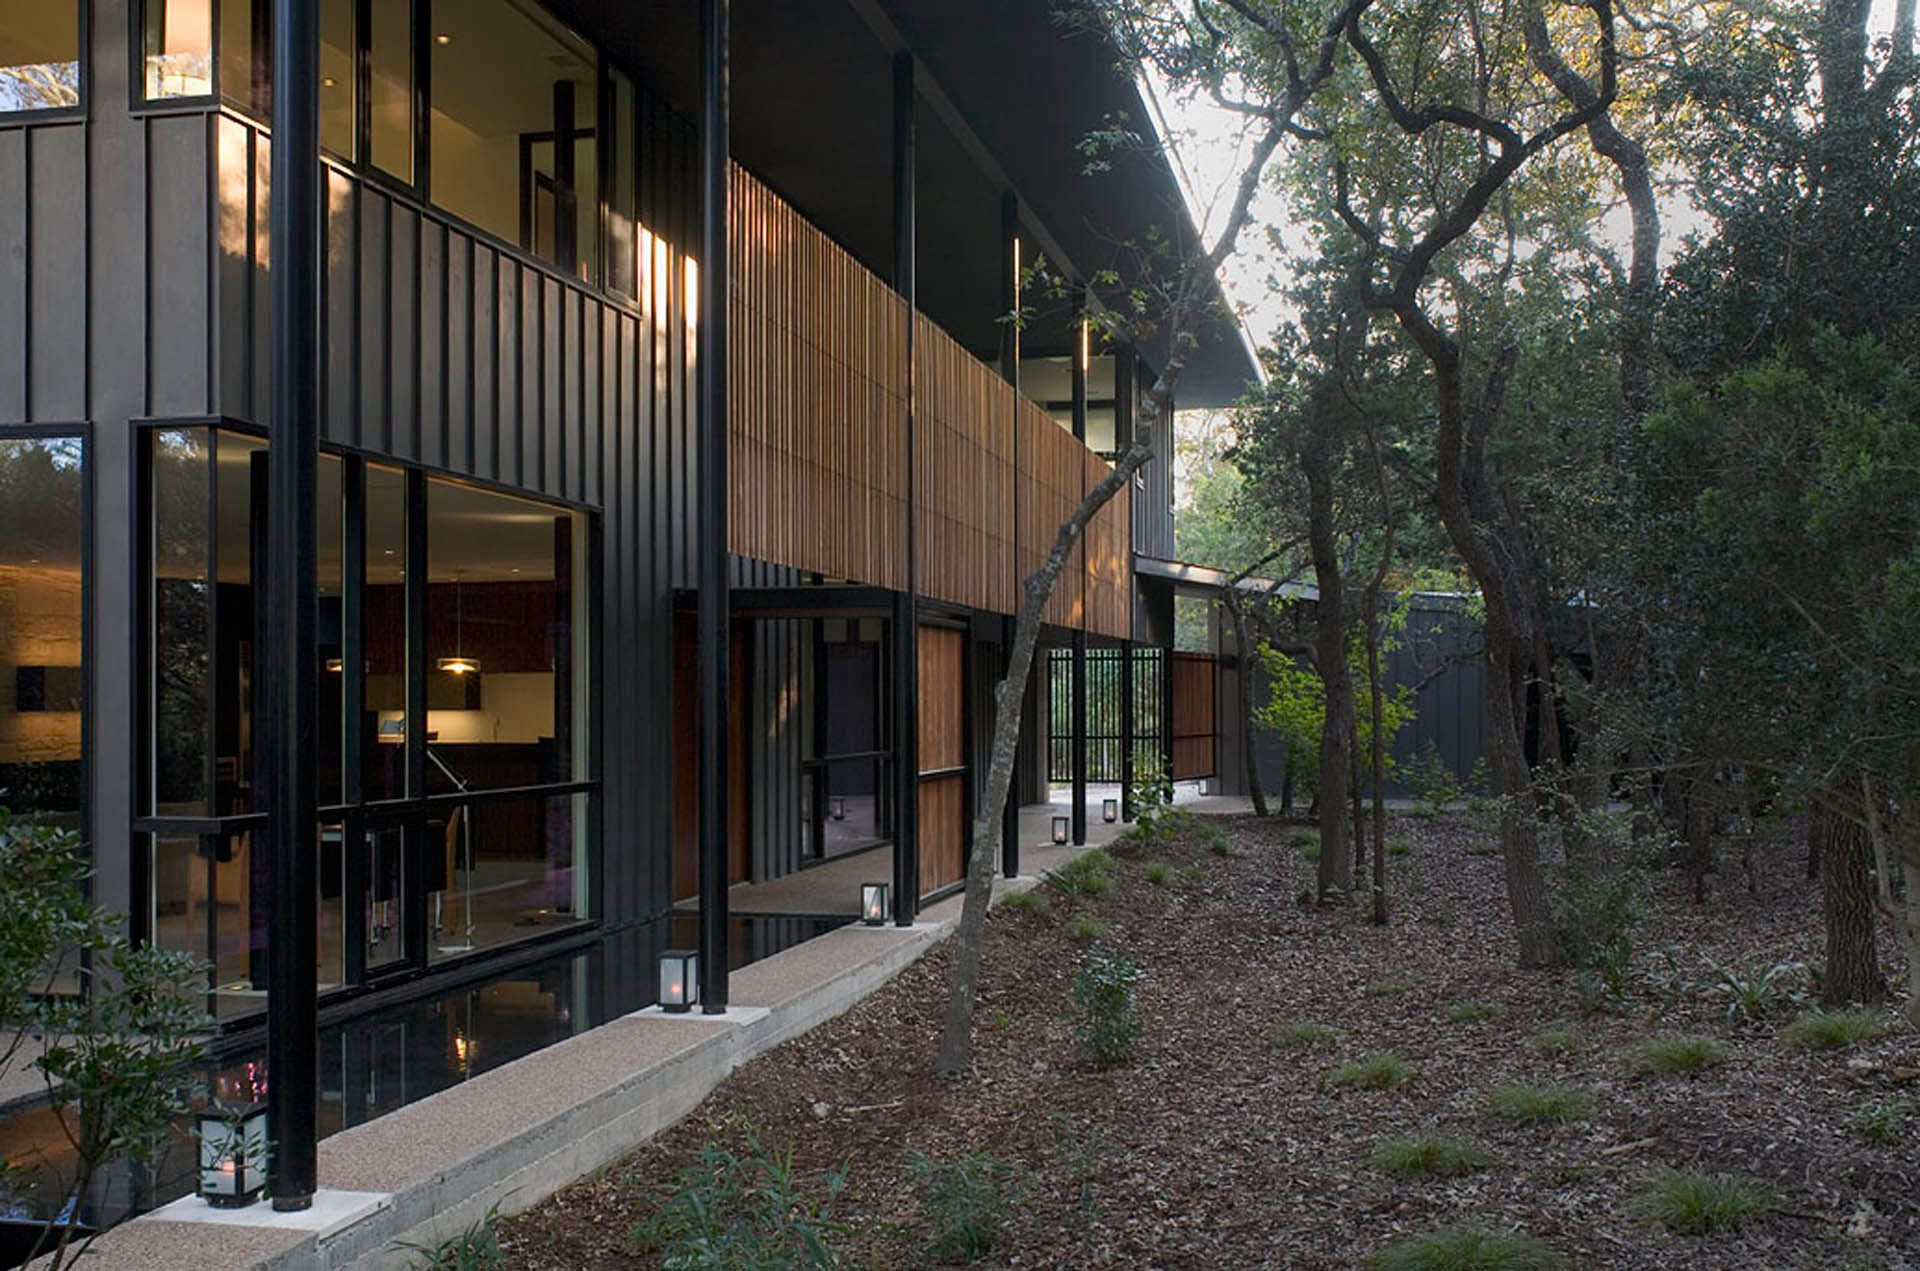 houseintrees 2 ext side.jpg